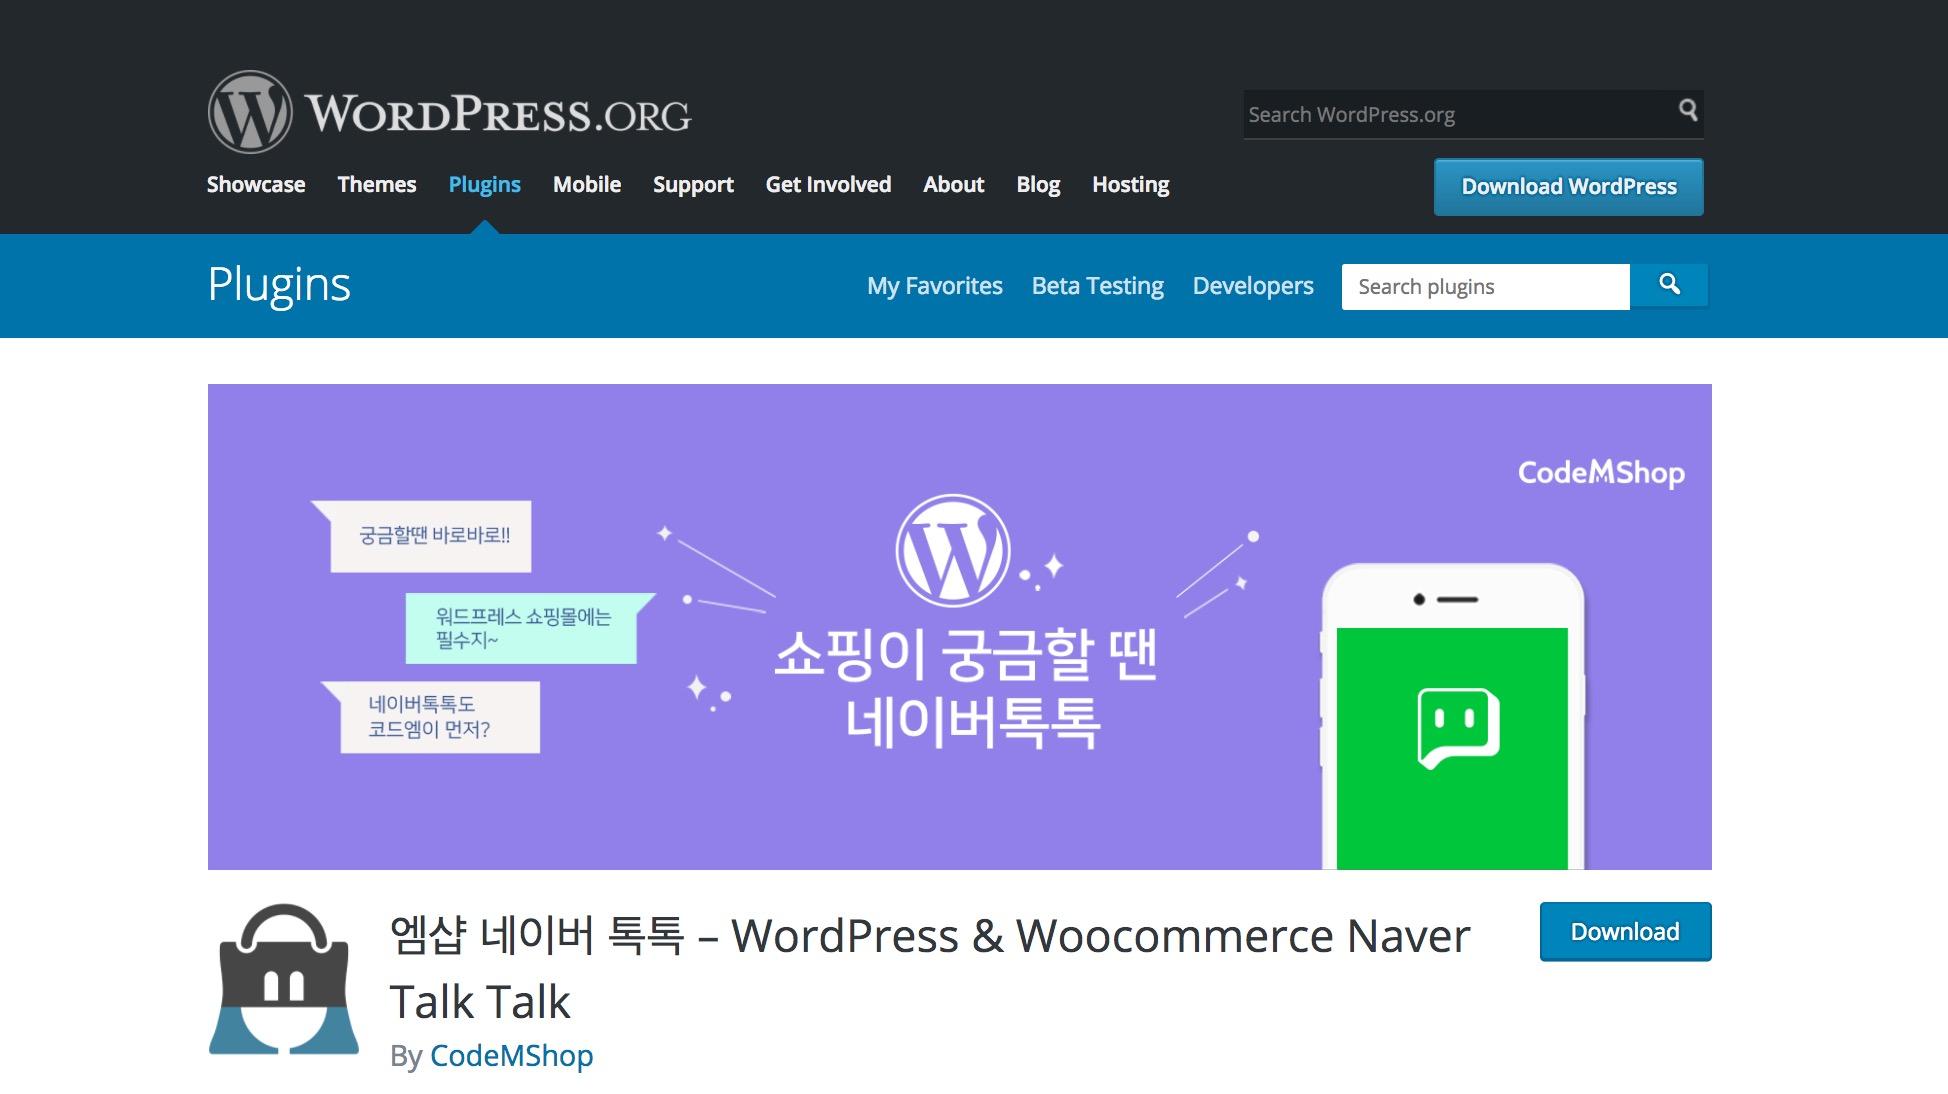 wordpress-live-chat-naver-talktalk-codemshop-7